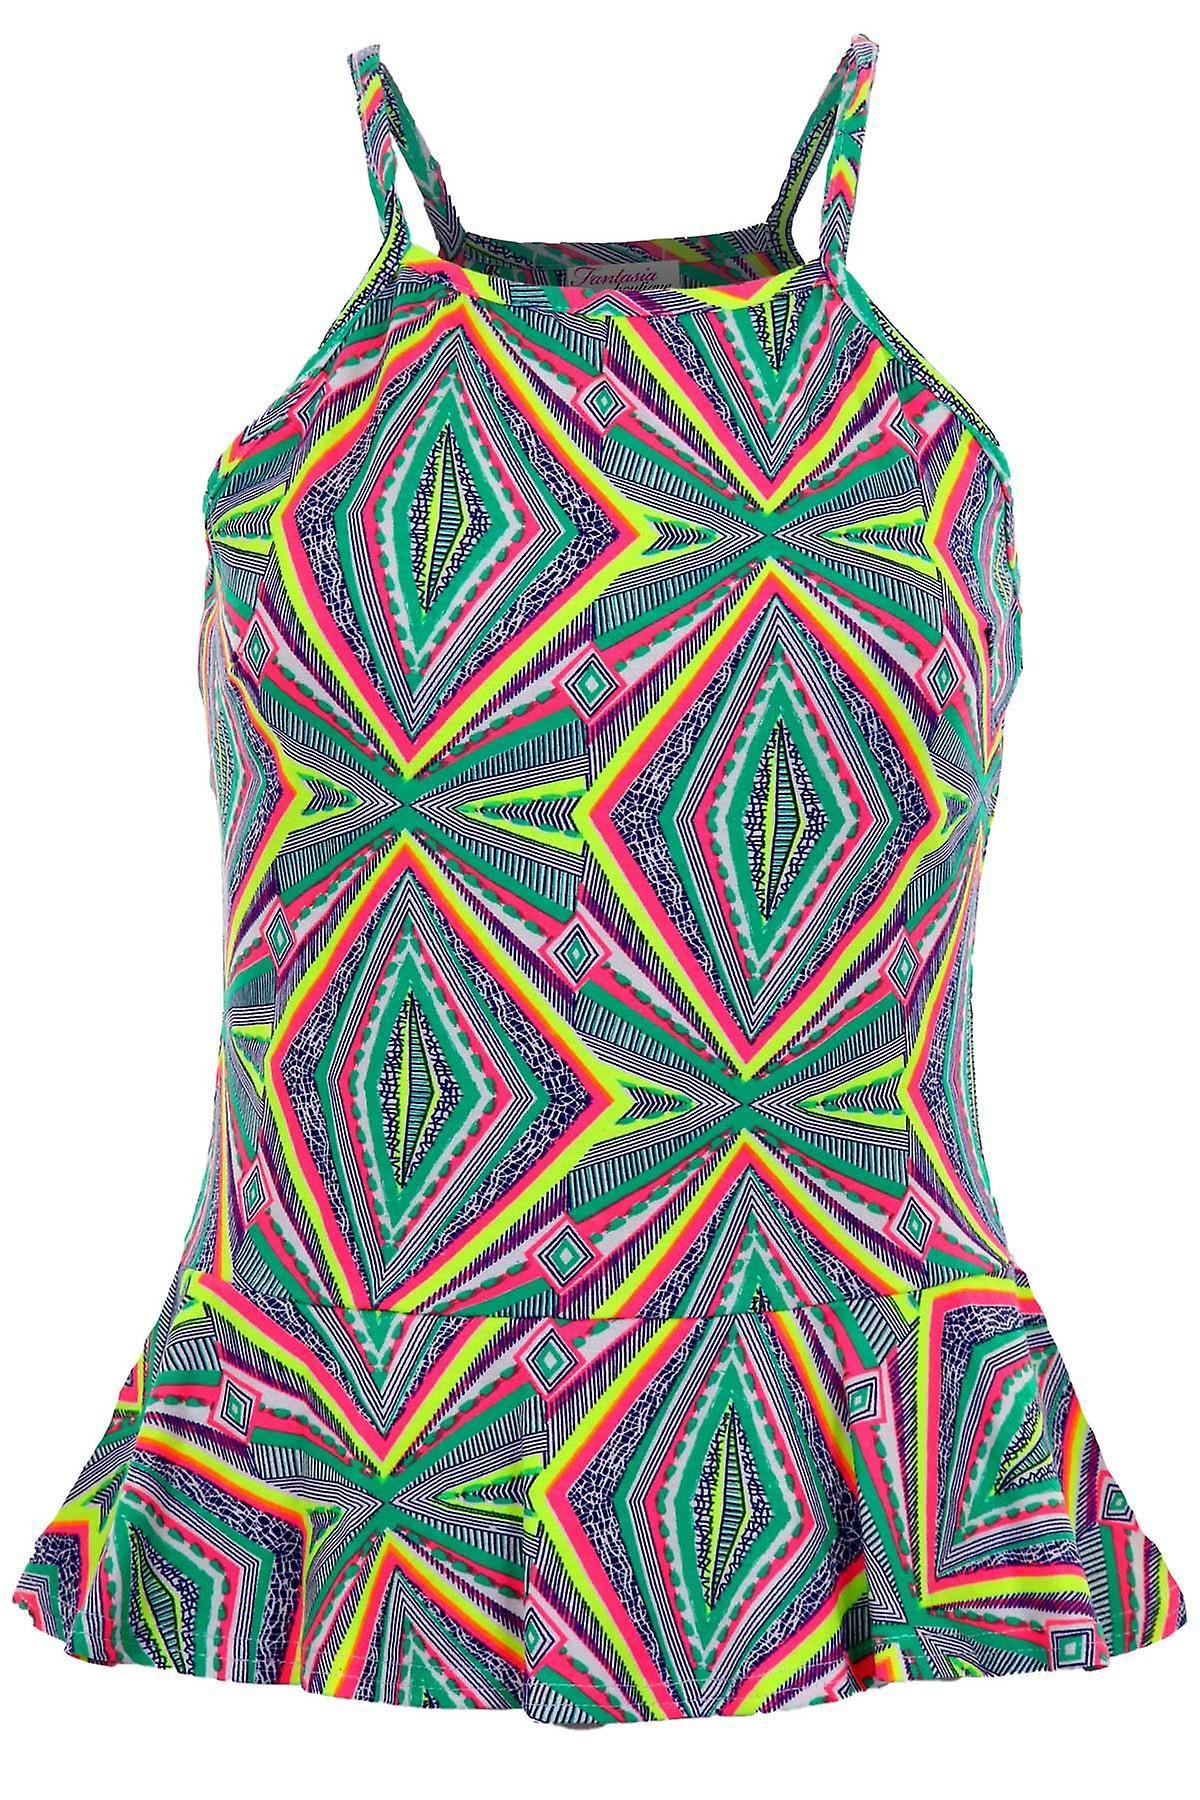 Ladies Sleeveless Strappy Cami Neon Aztec Print Women's Frill Peplum Vest Top